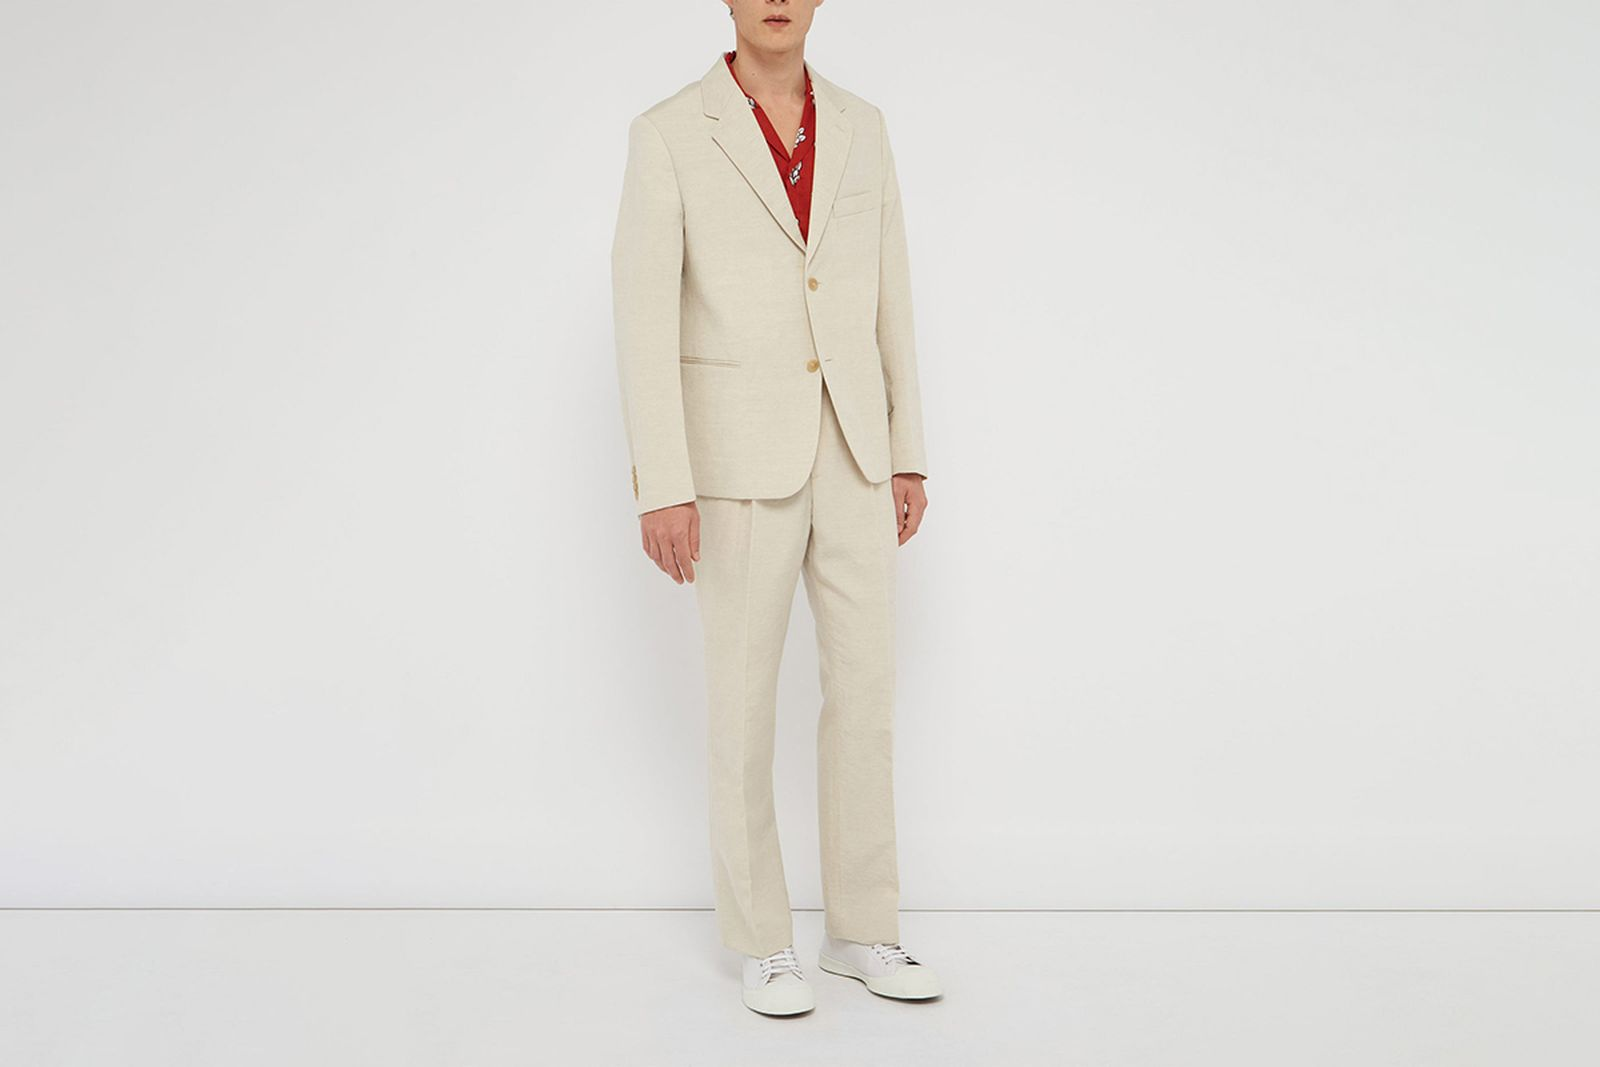 Linen suits summer main jacquemus mr porter thom brown